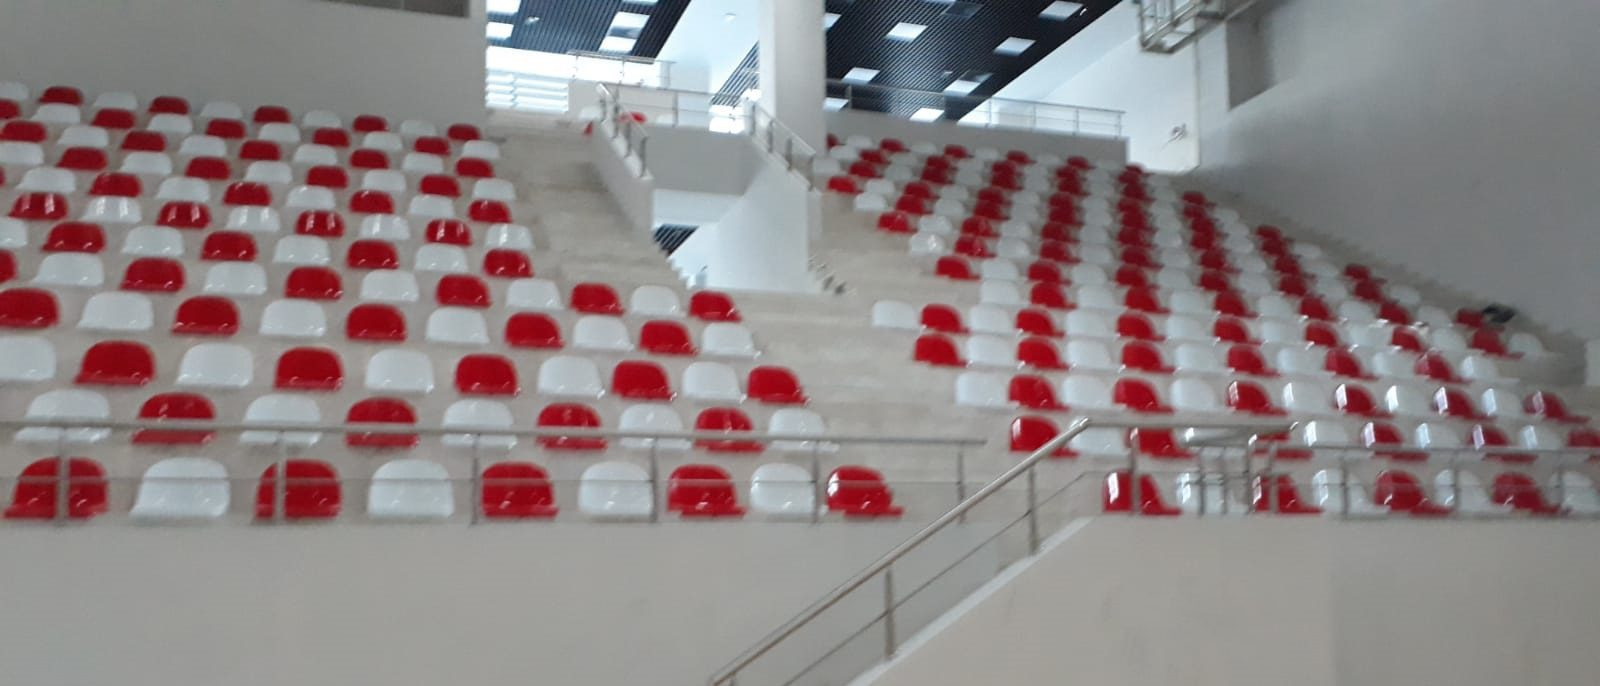 Küçükköy Kapalı Spor Salonu / İstanbul